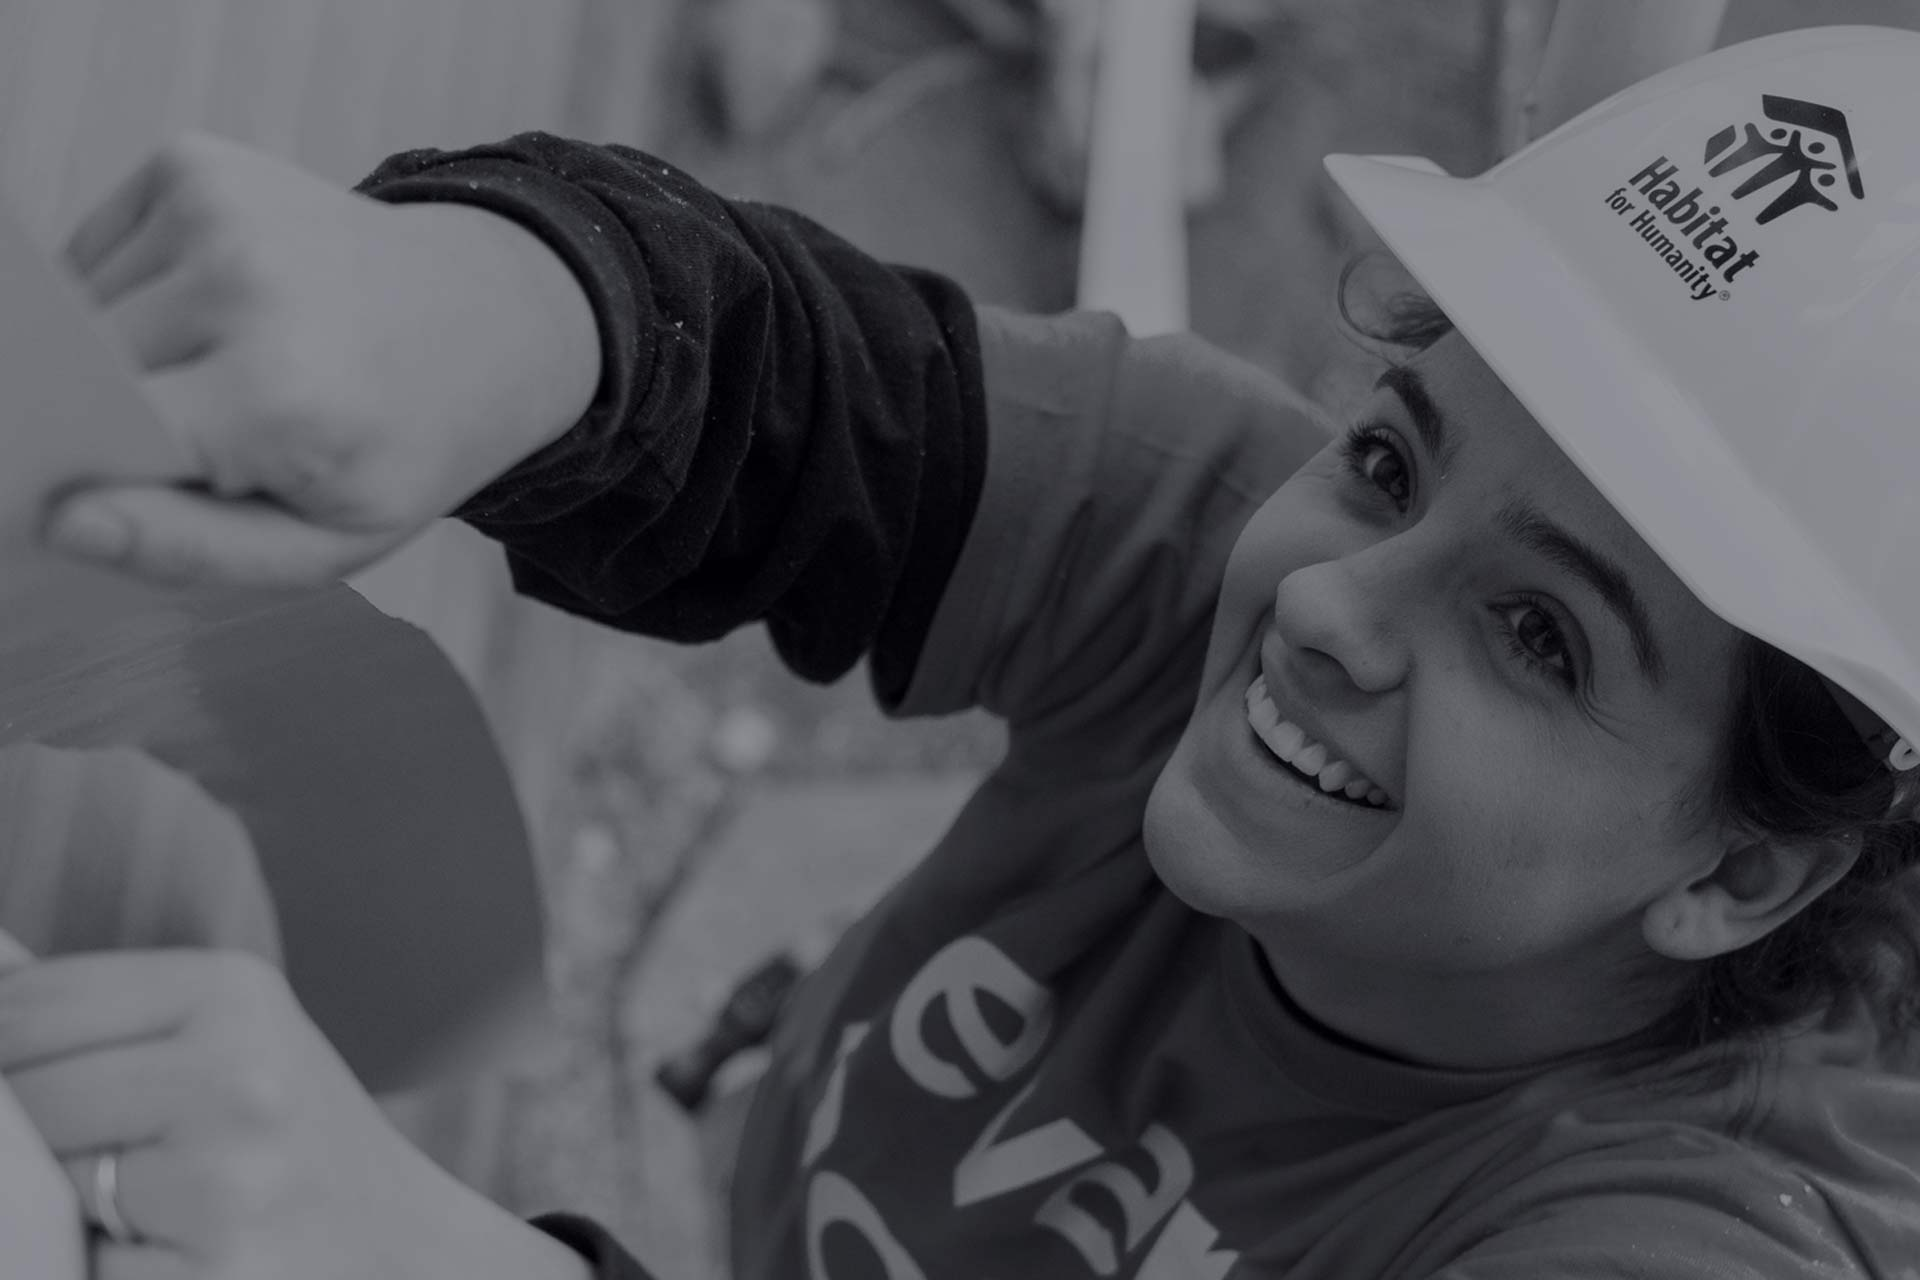 Women in construction week highlight: Denise Peske